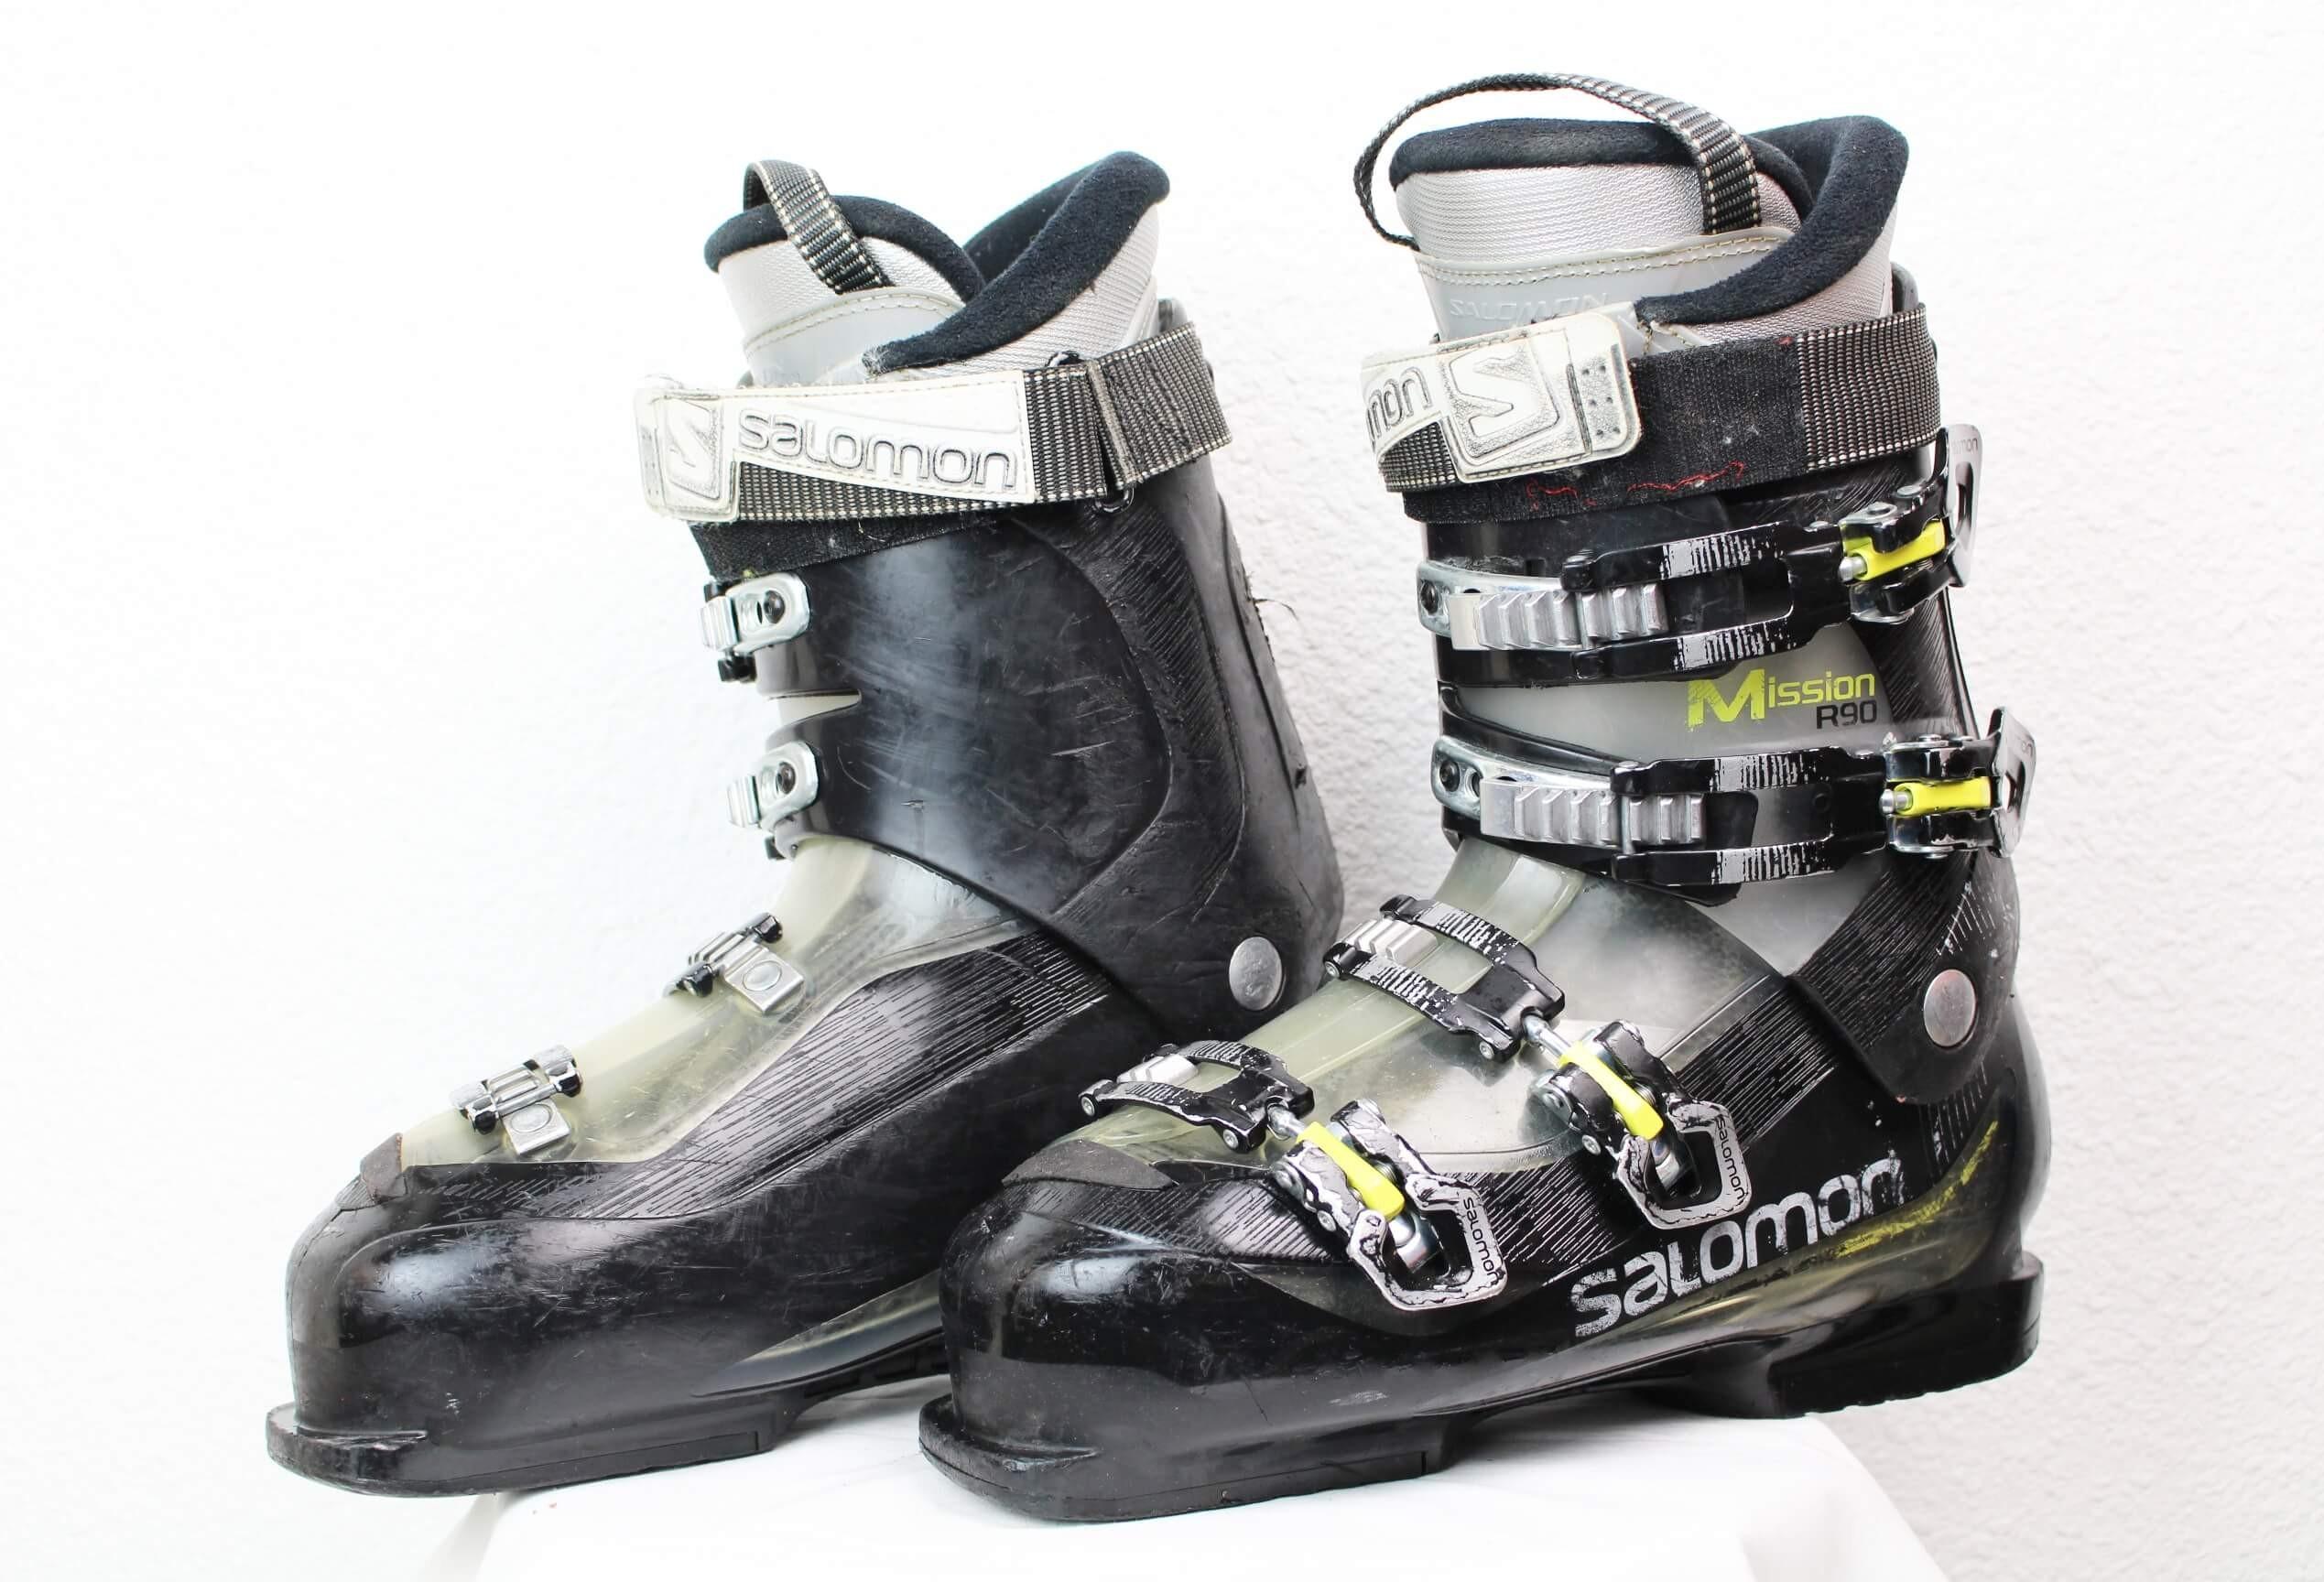 Mission Salomon Chaussures Ski R90 Skioccas De tqn6wf1